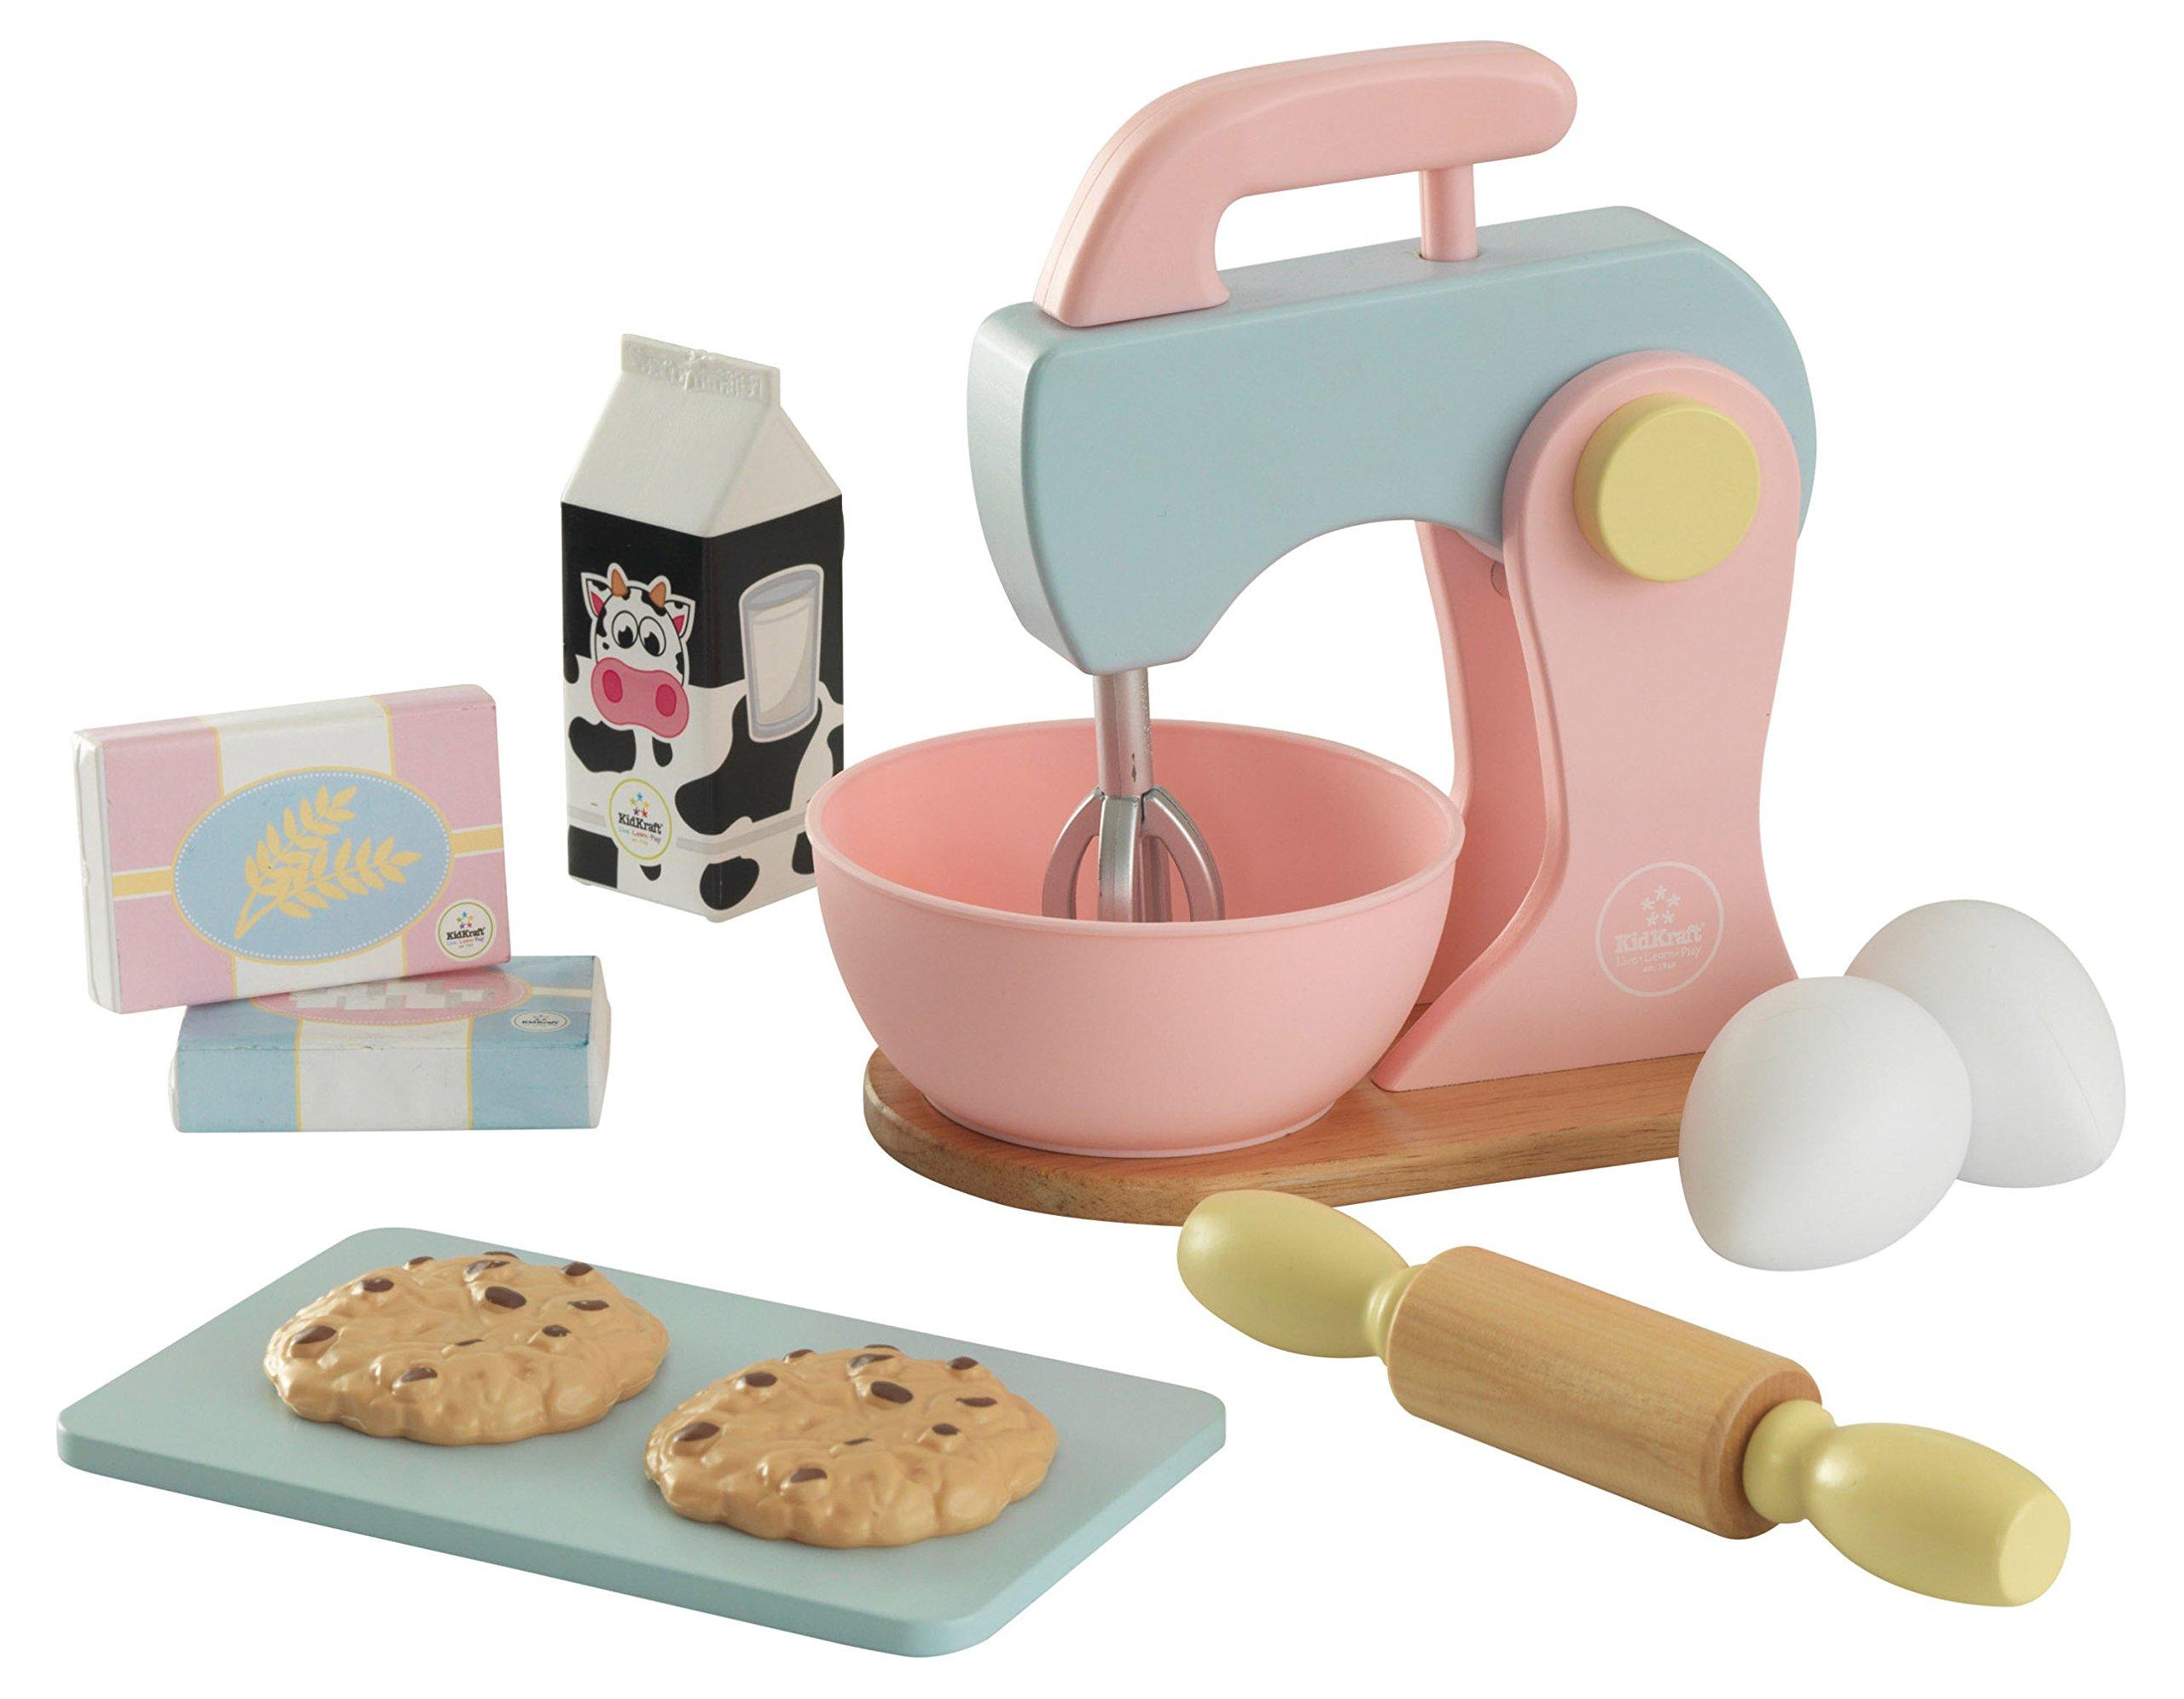 KidKraft Children's Baking Set - Pastel Role Play Toys for The Kitchen by KidKraft